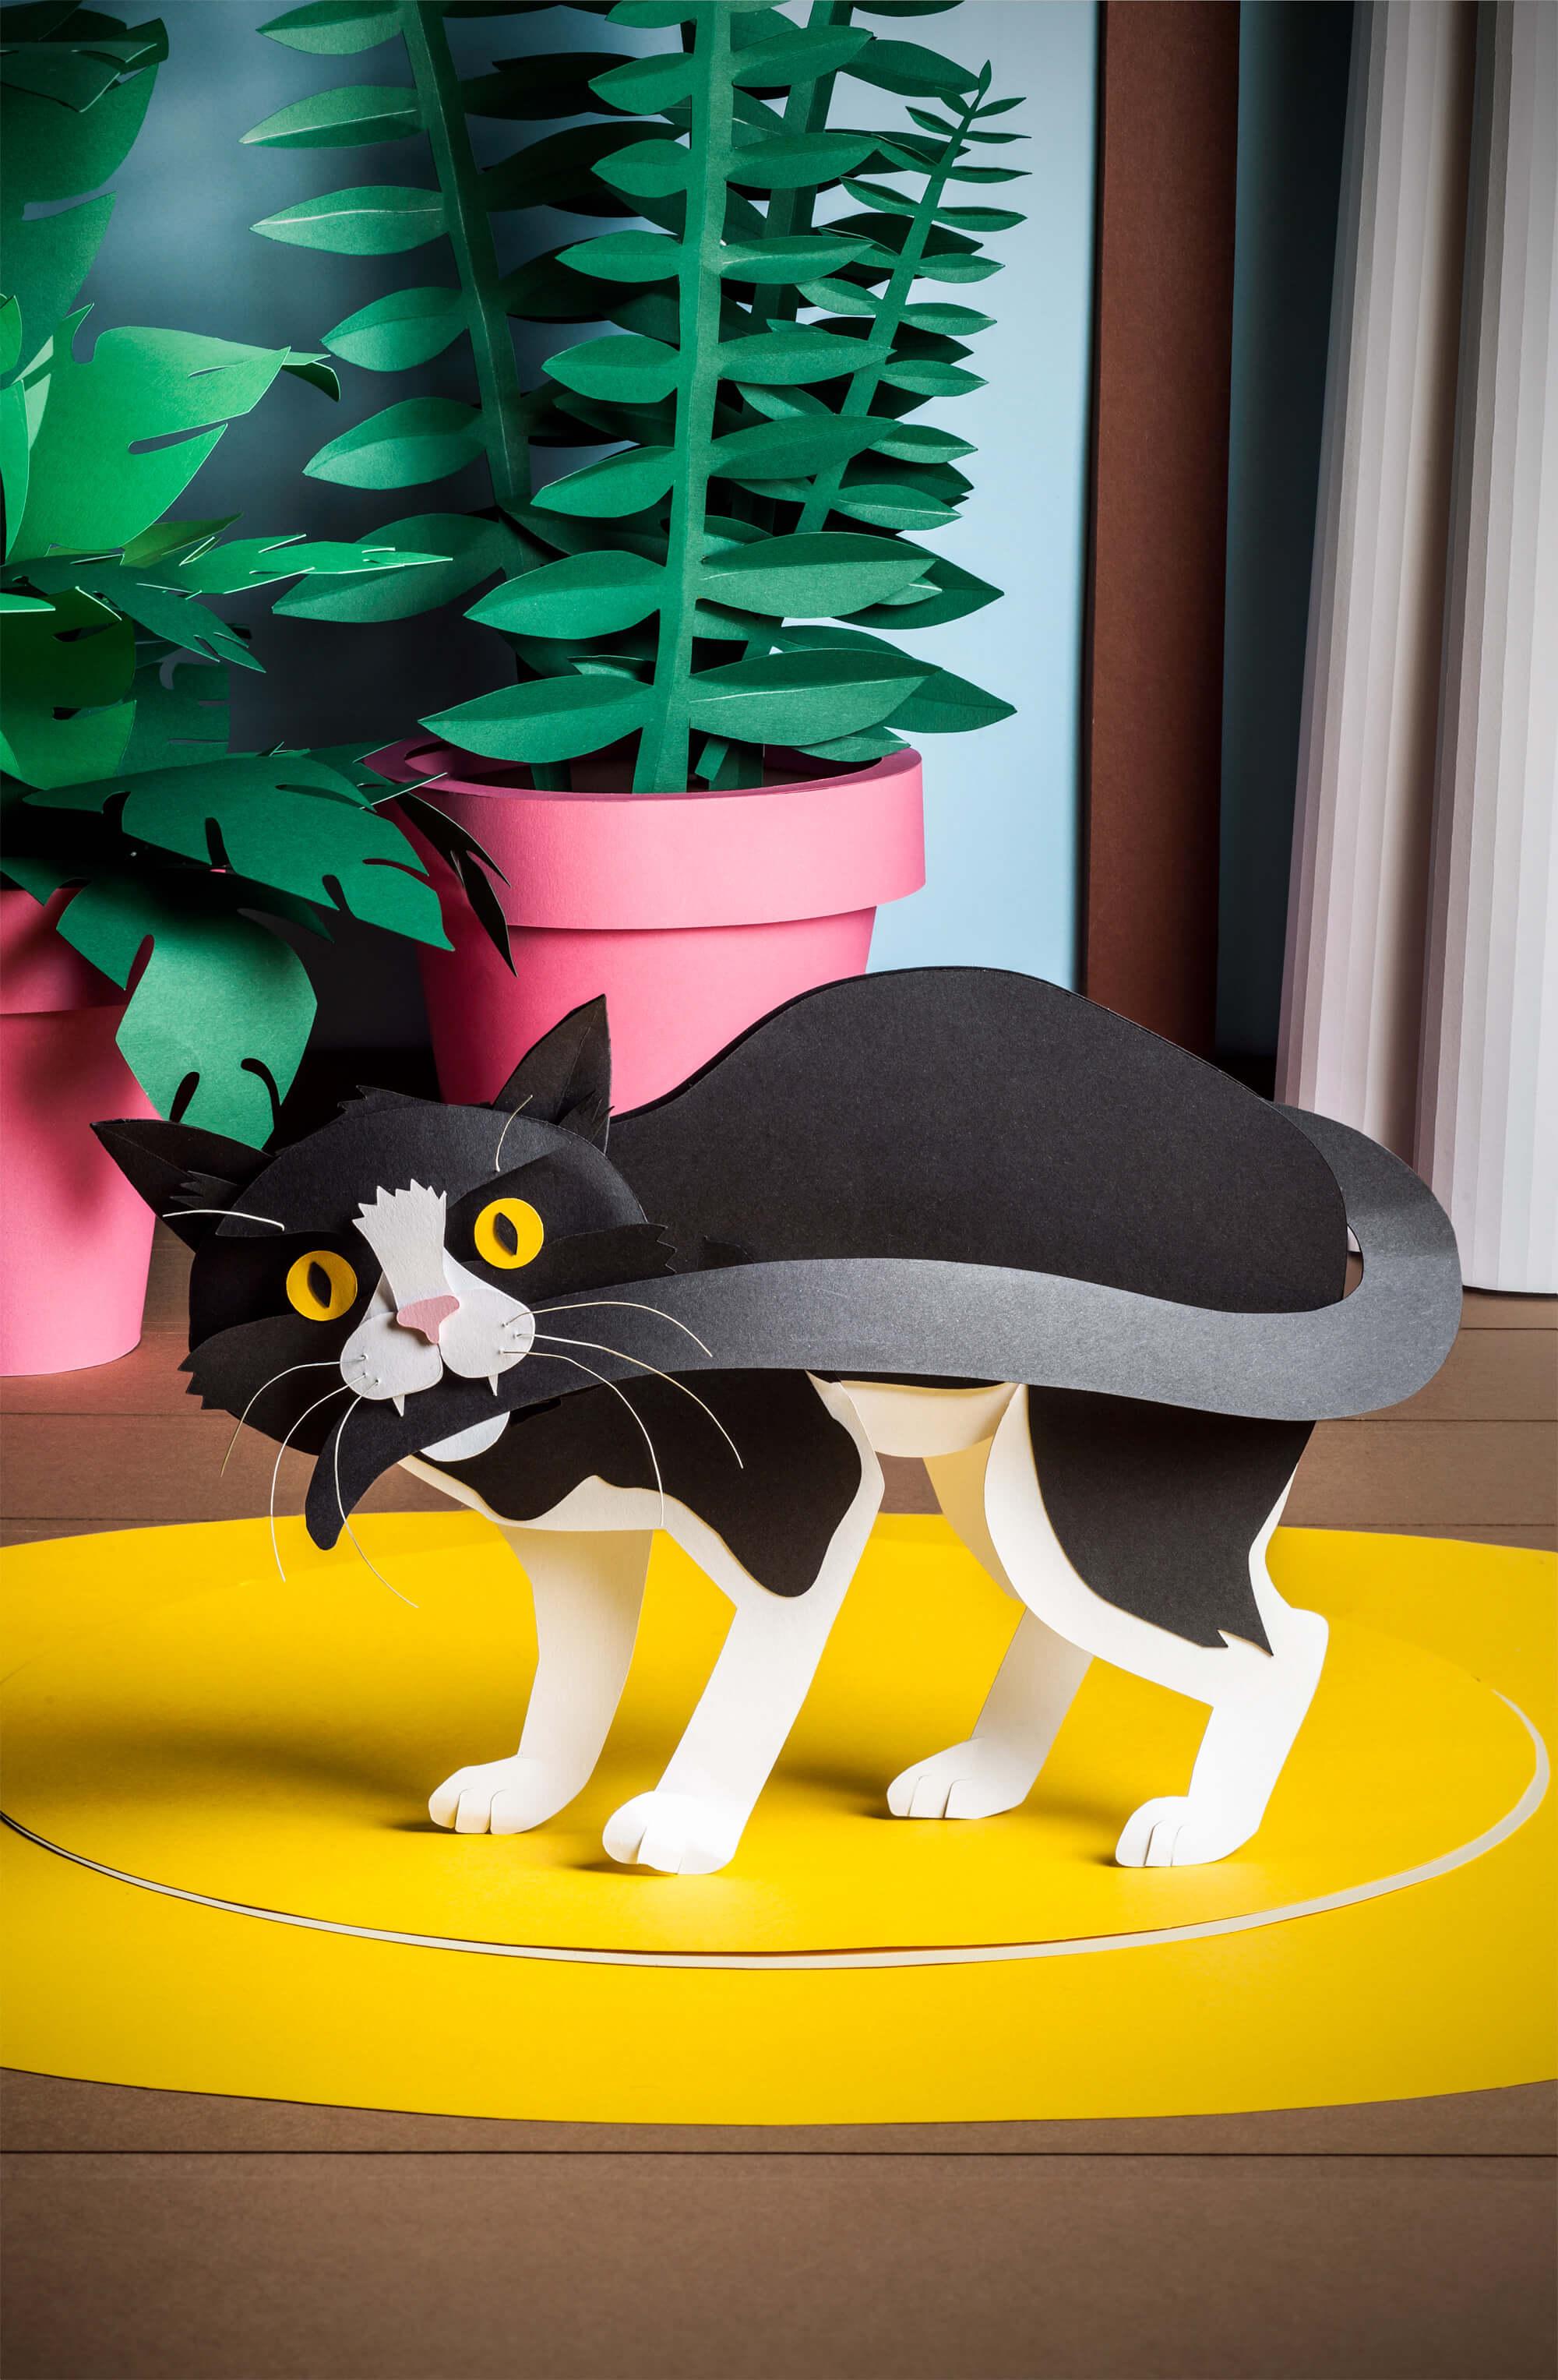 allianz_cat_paperart_katrinrodegast_webs